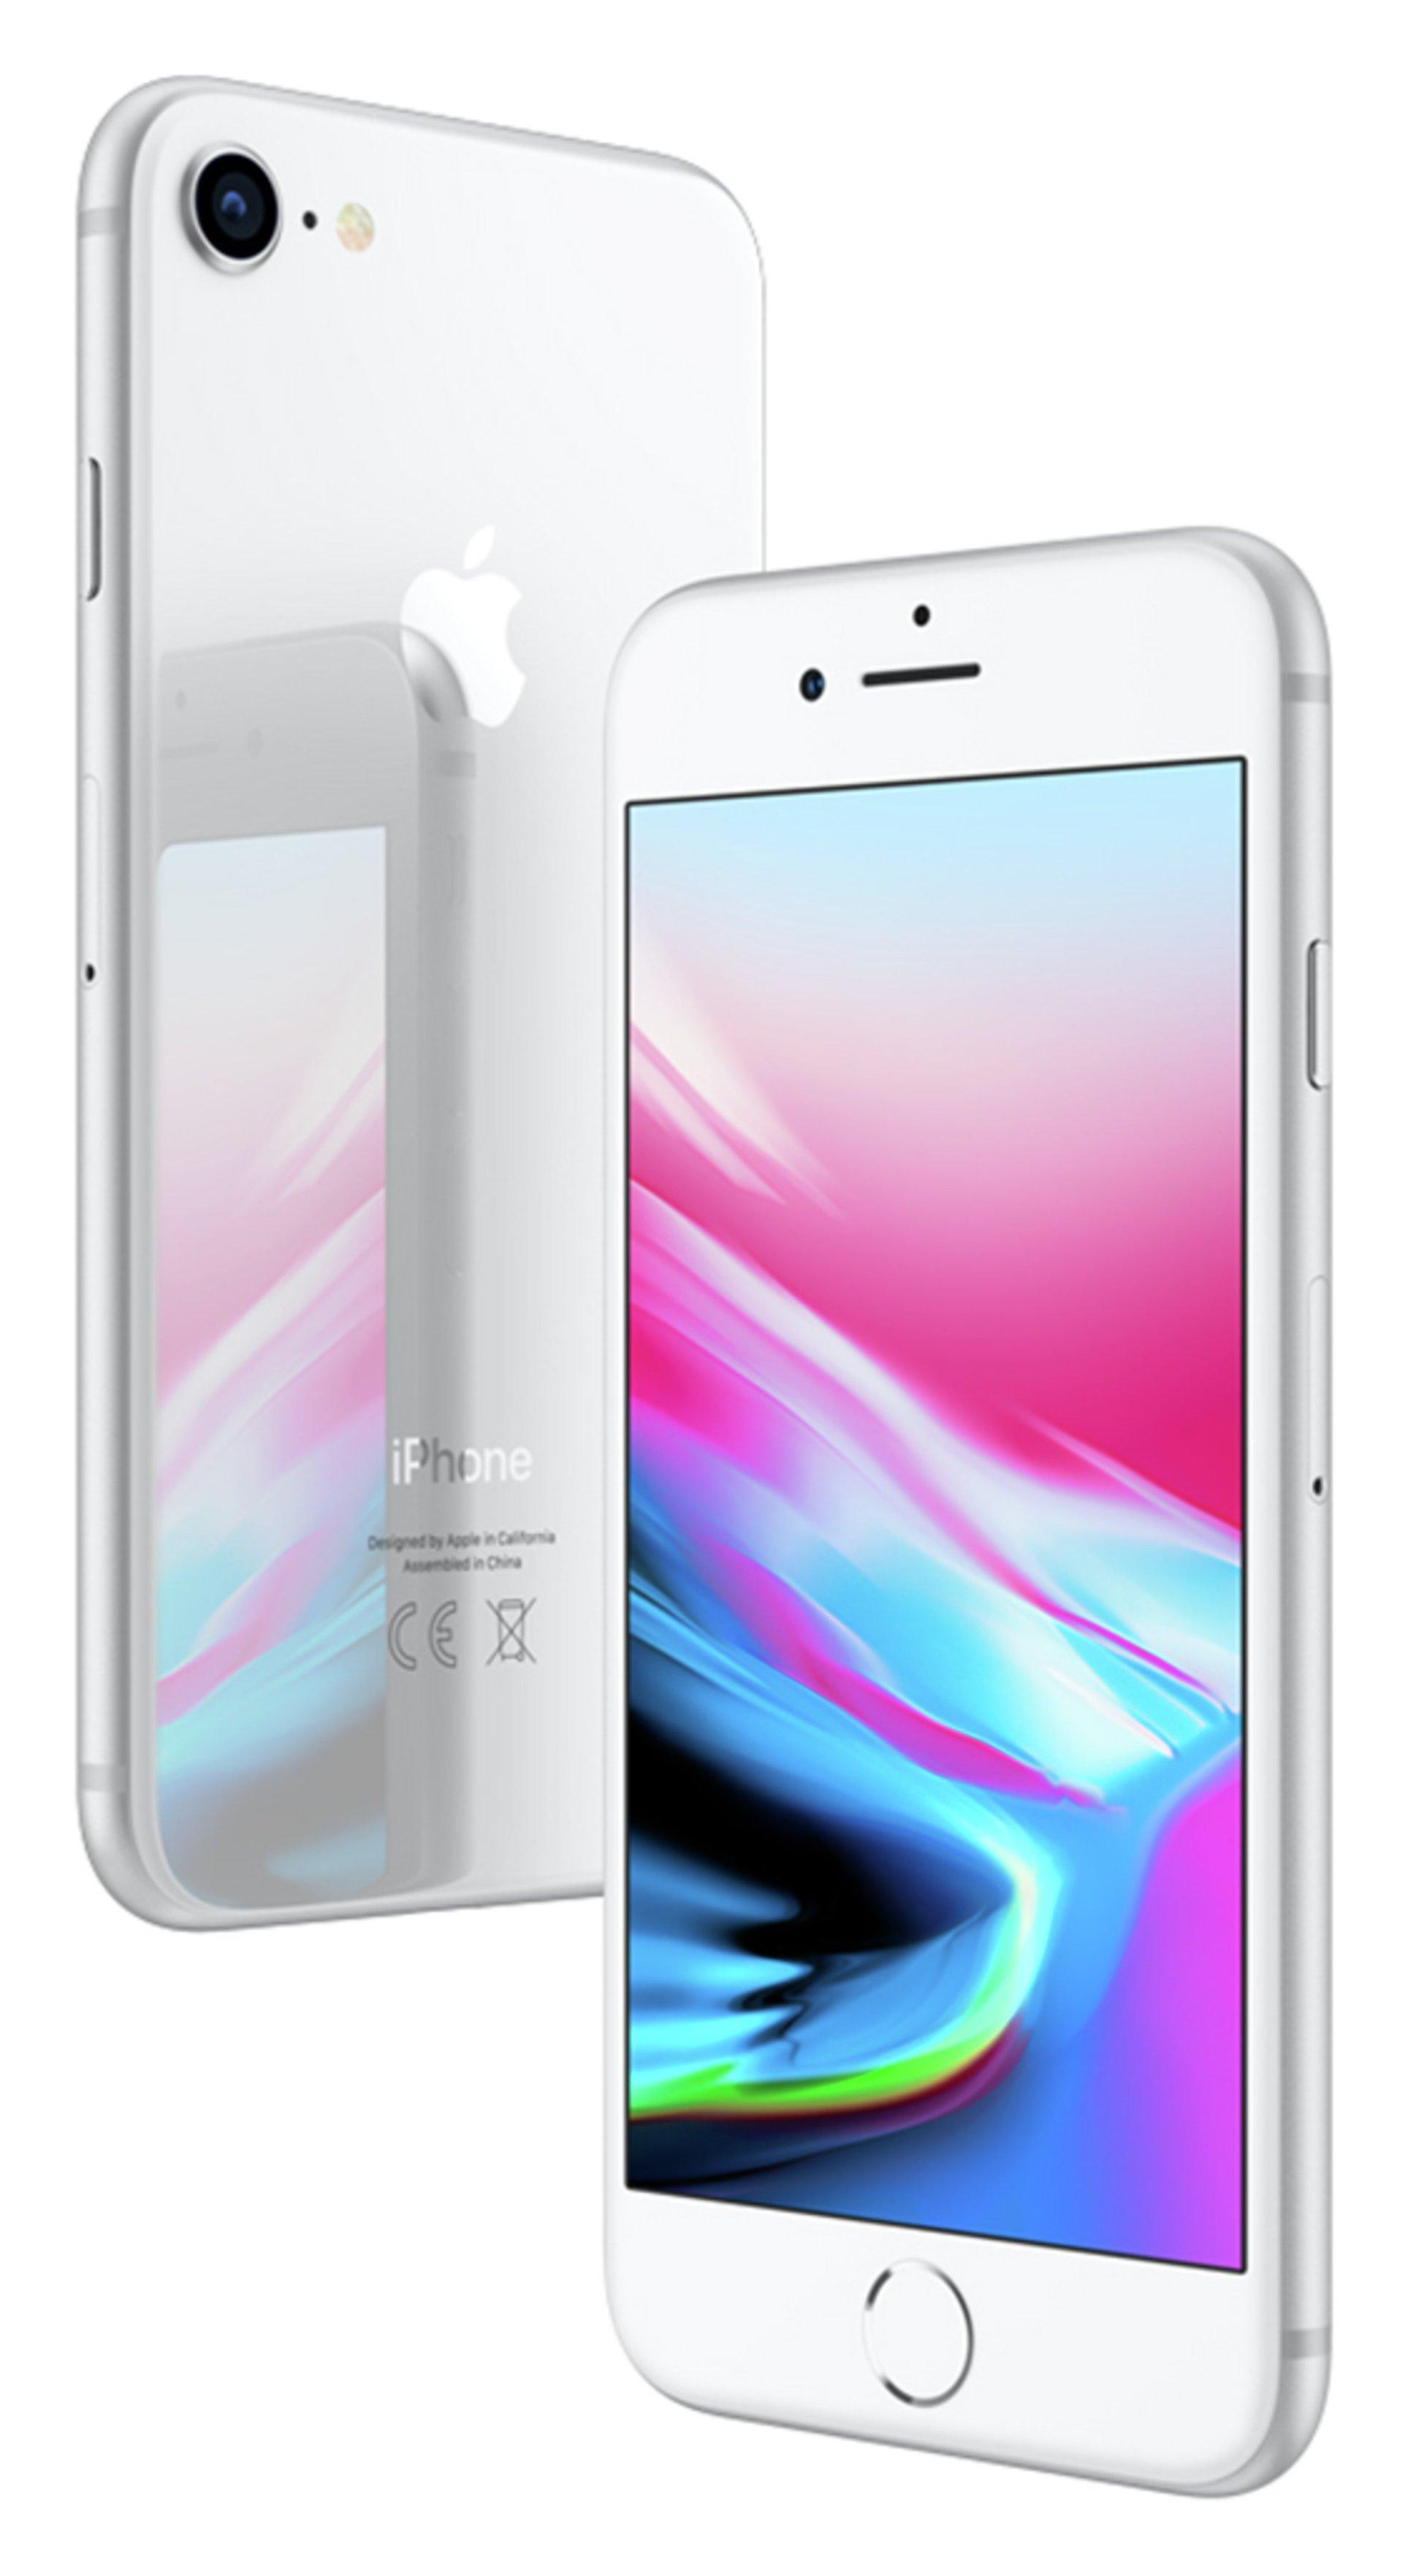 Apple Sim Free iPhone 8 256GB Mobile Phone - Silver